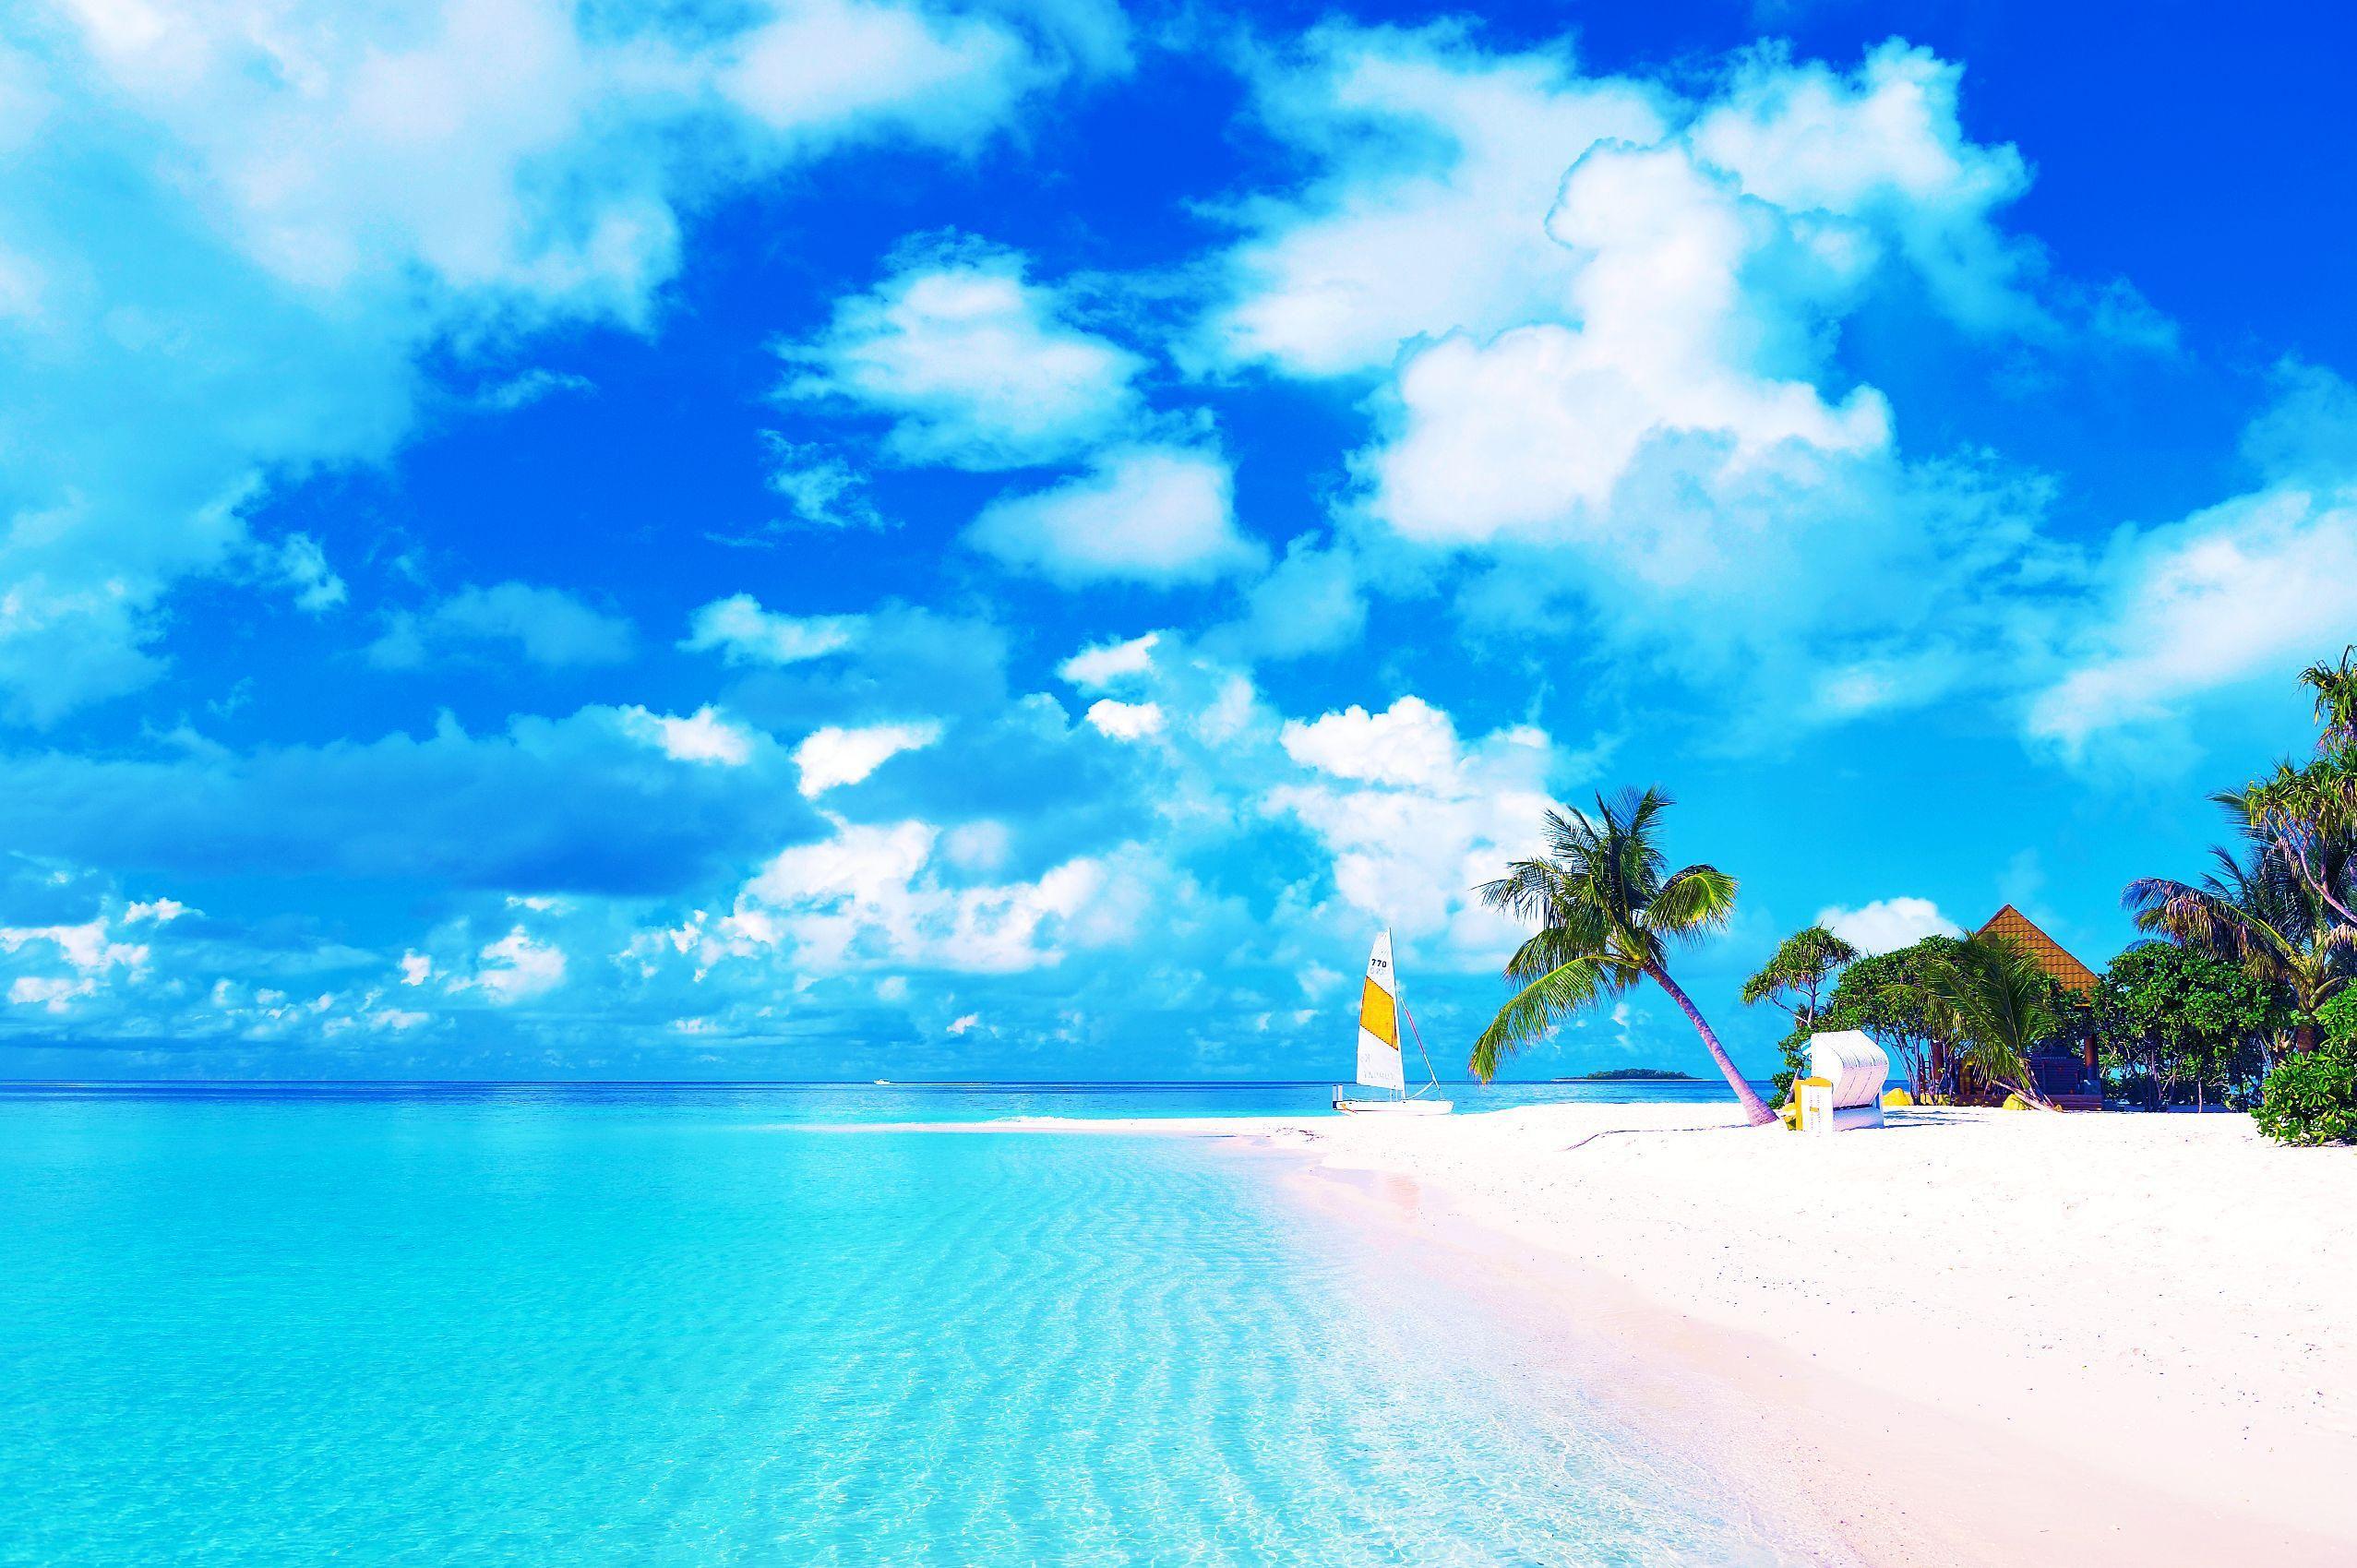 Hd wallpaper travel - Beach Travel Solomon Islands Full Hd Wallpapers